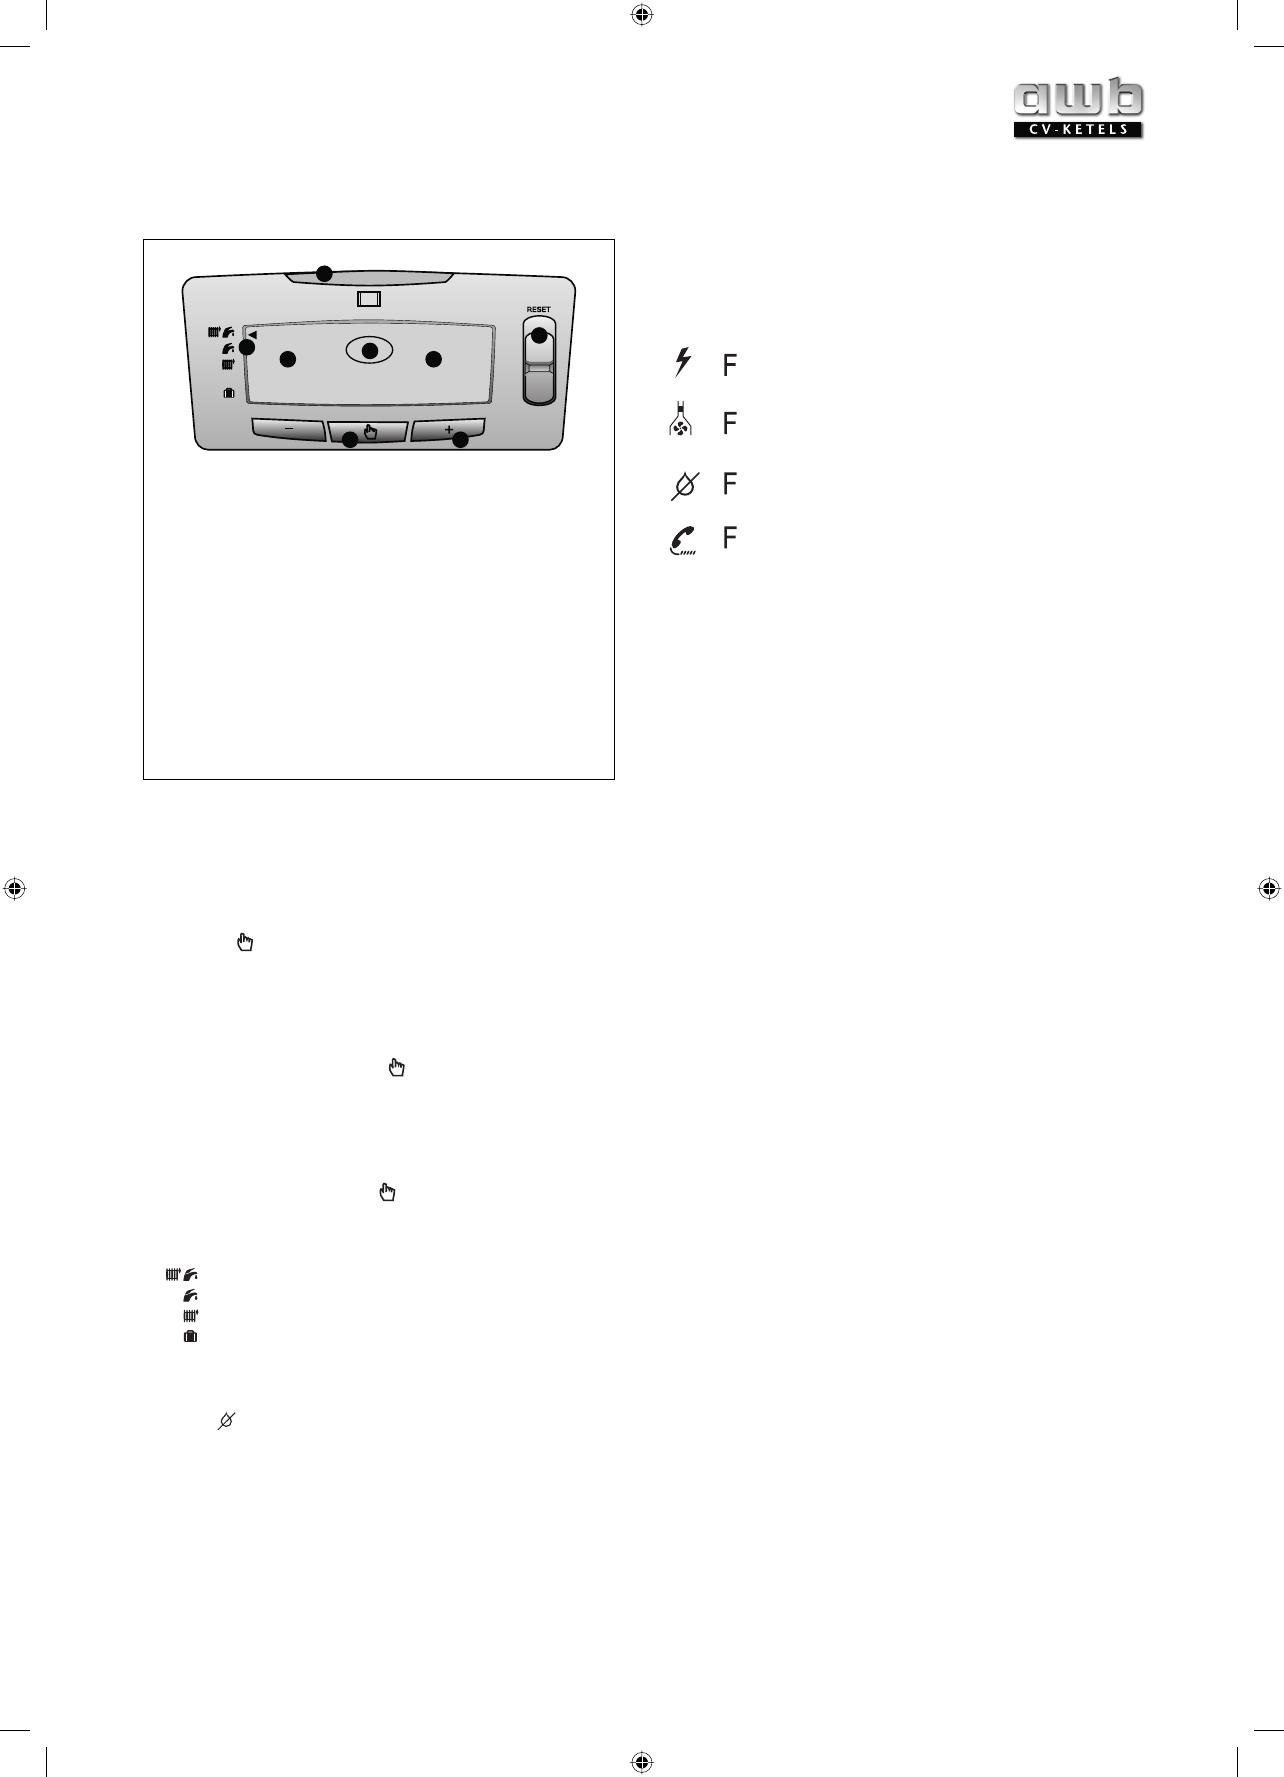 Ongekend Handleiding AWB Thermomaster VR 24T (pagina 1 van 24) (Nederlands) HR-22